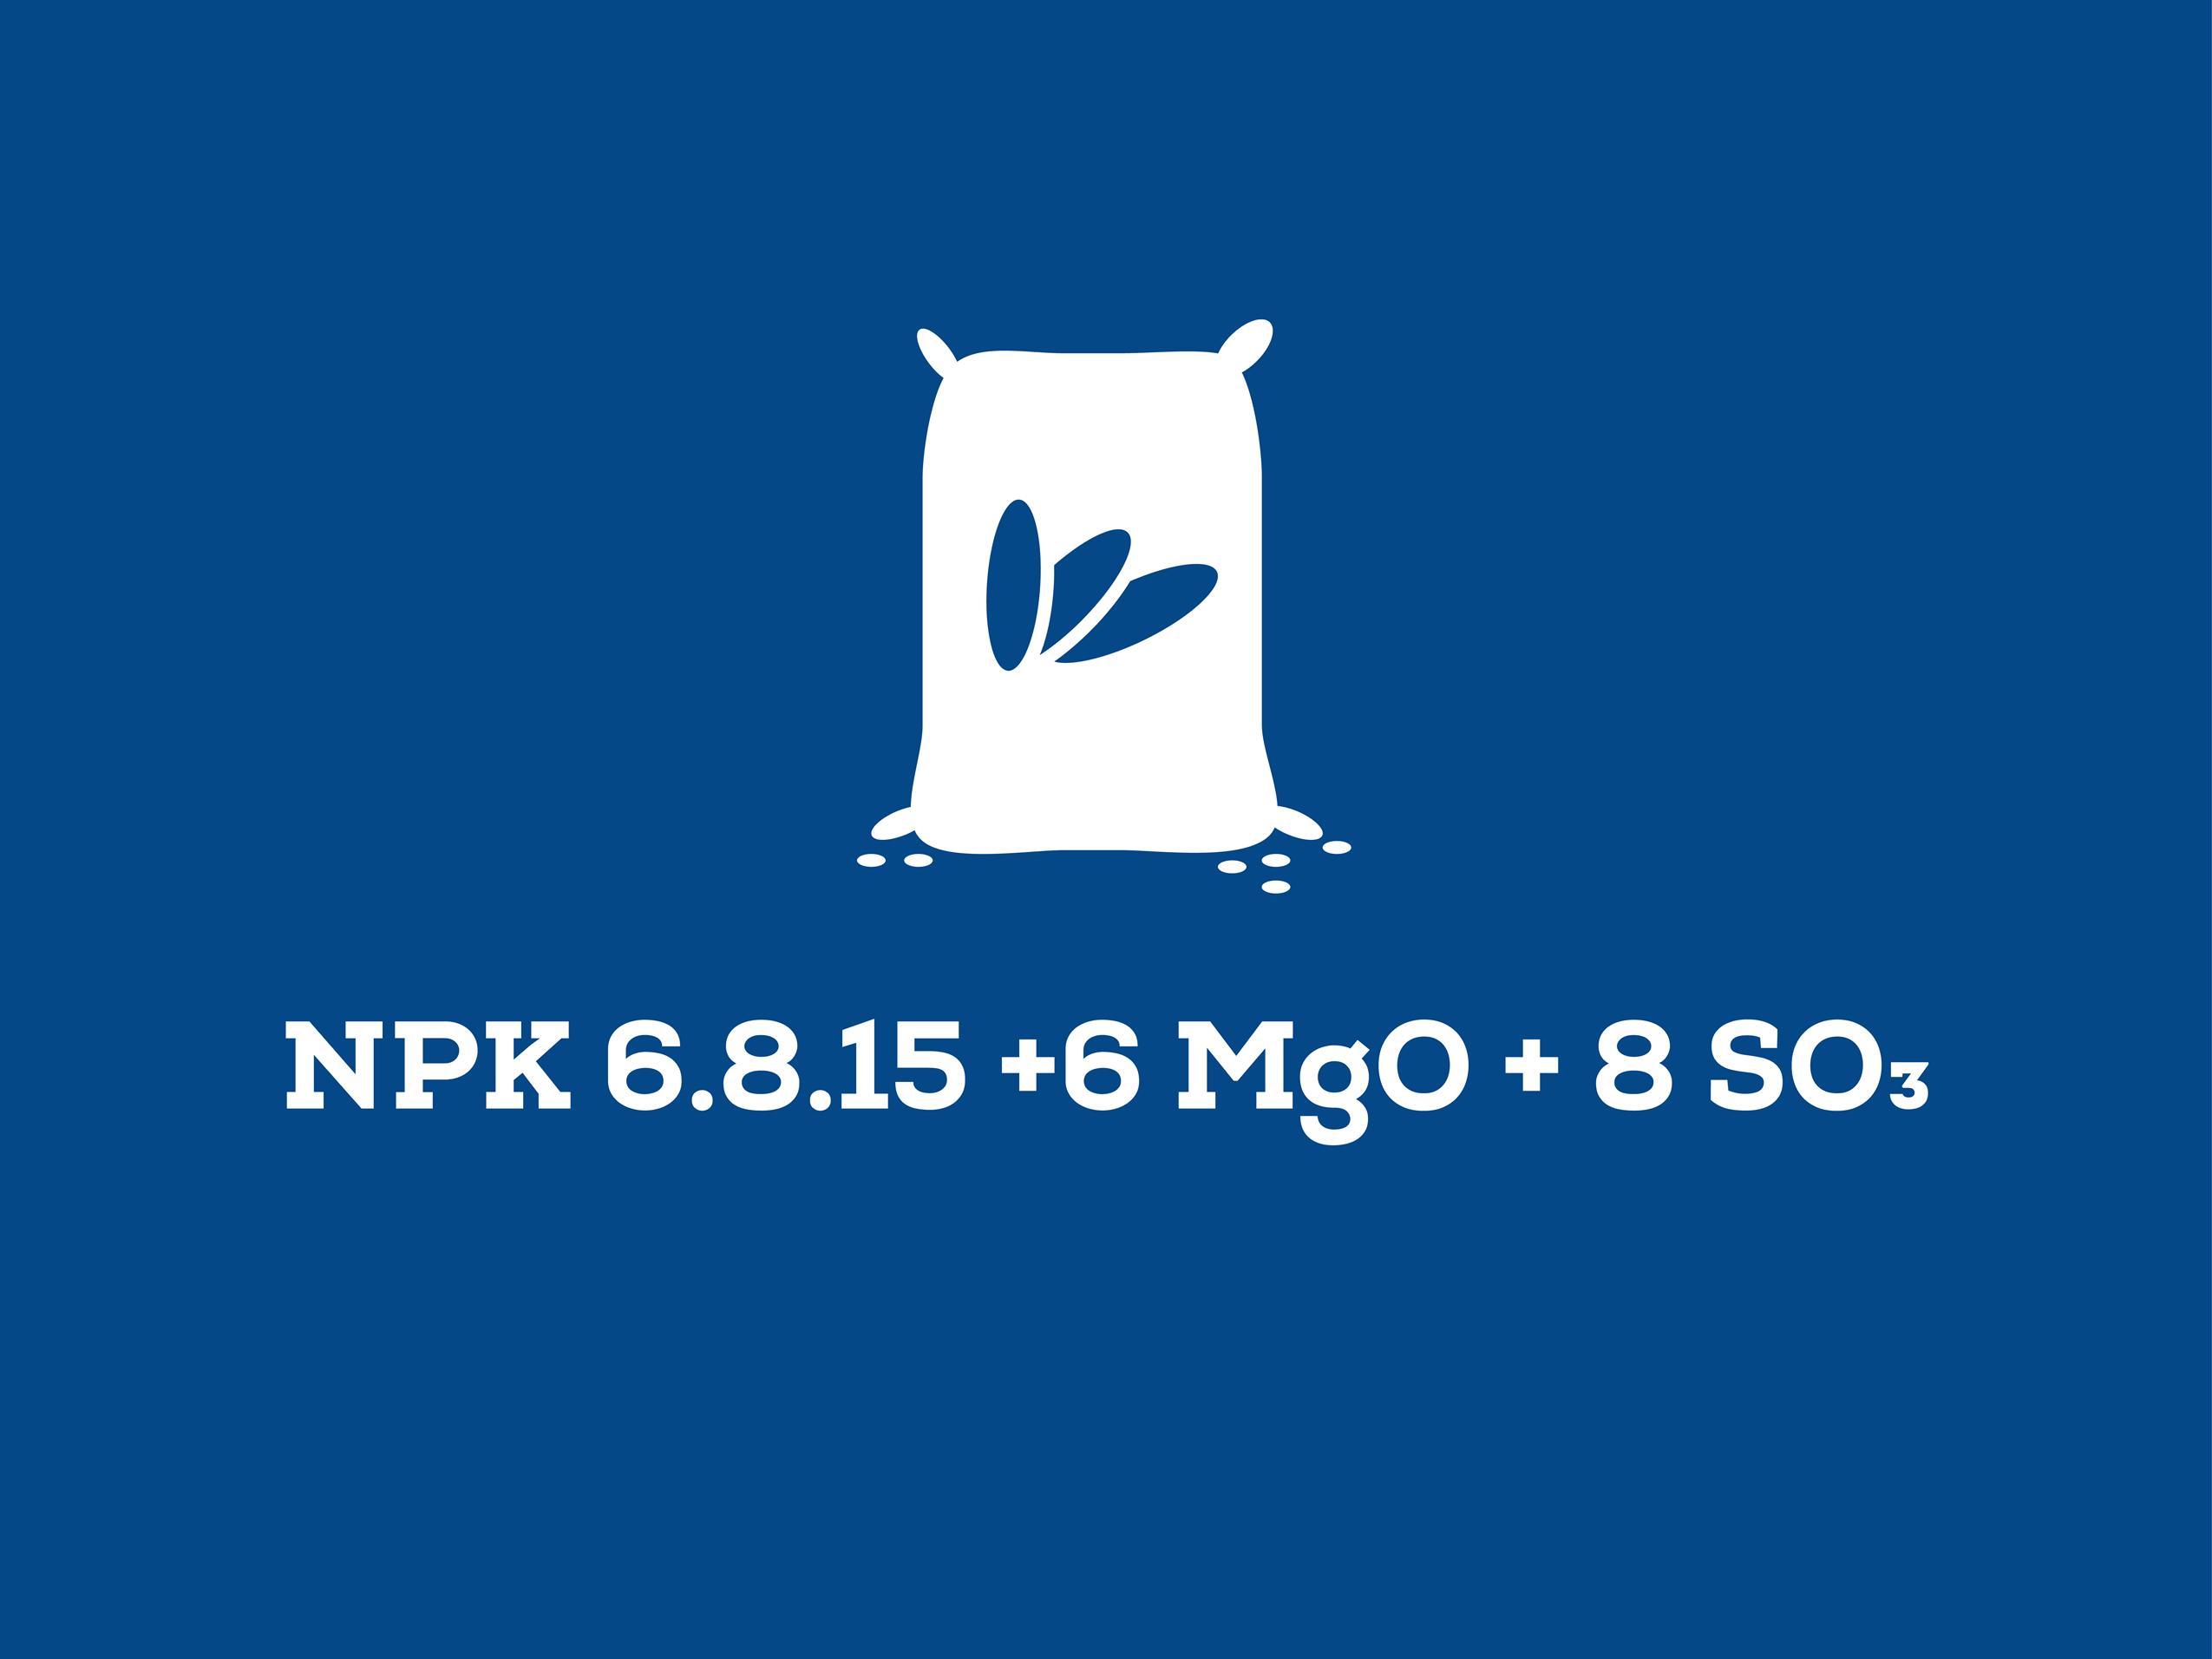 NPK 6.8.15 +6 MgO + 8 SO3